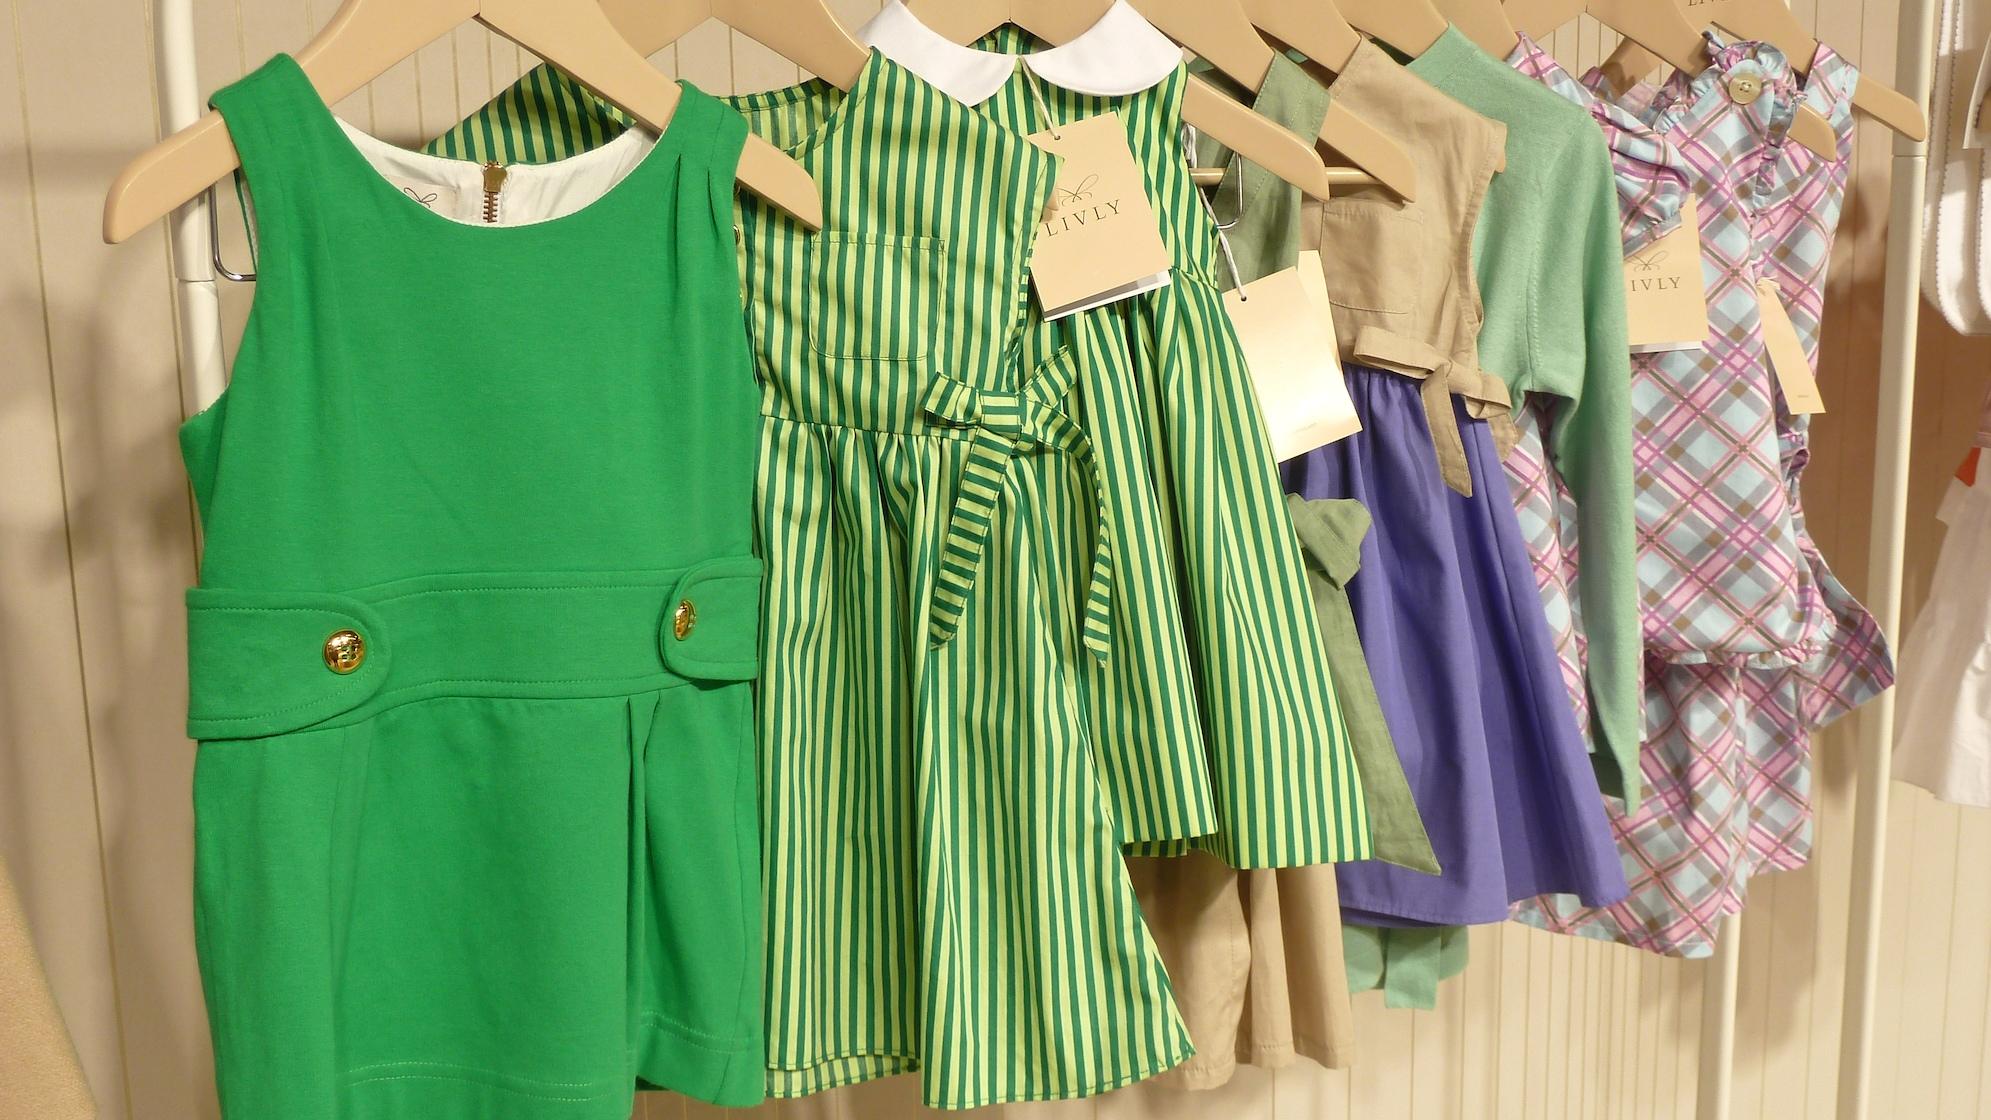 Cute Vintage Inspired Dresses